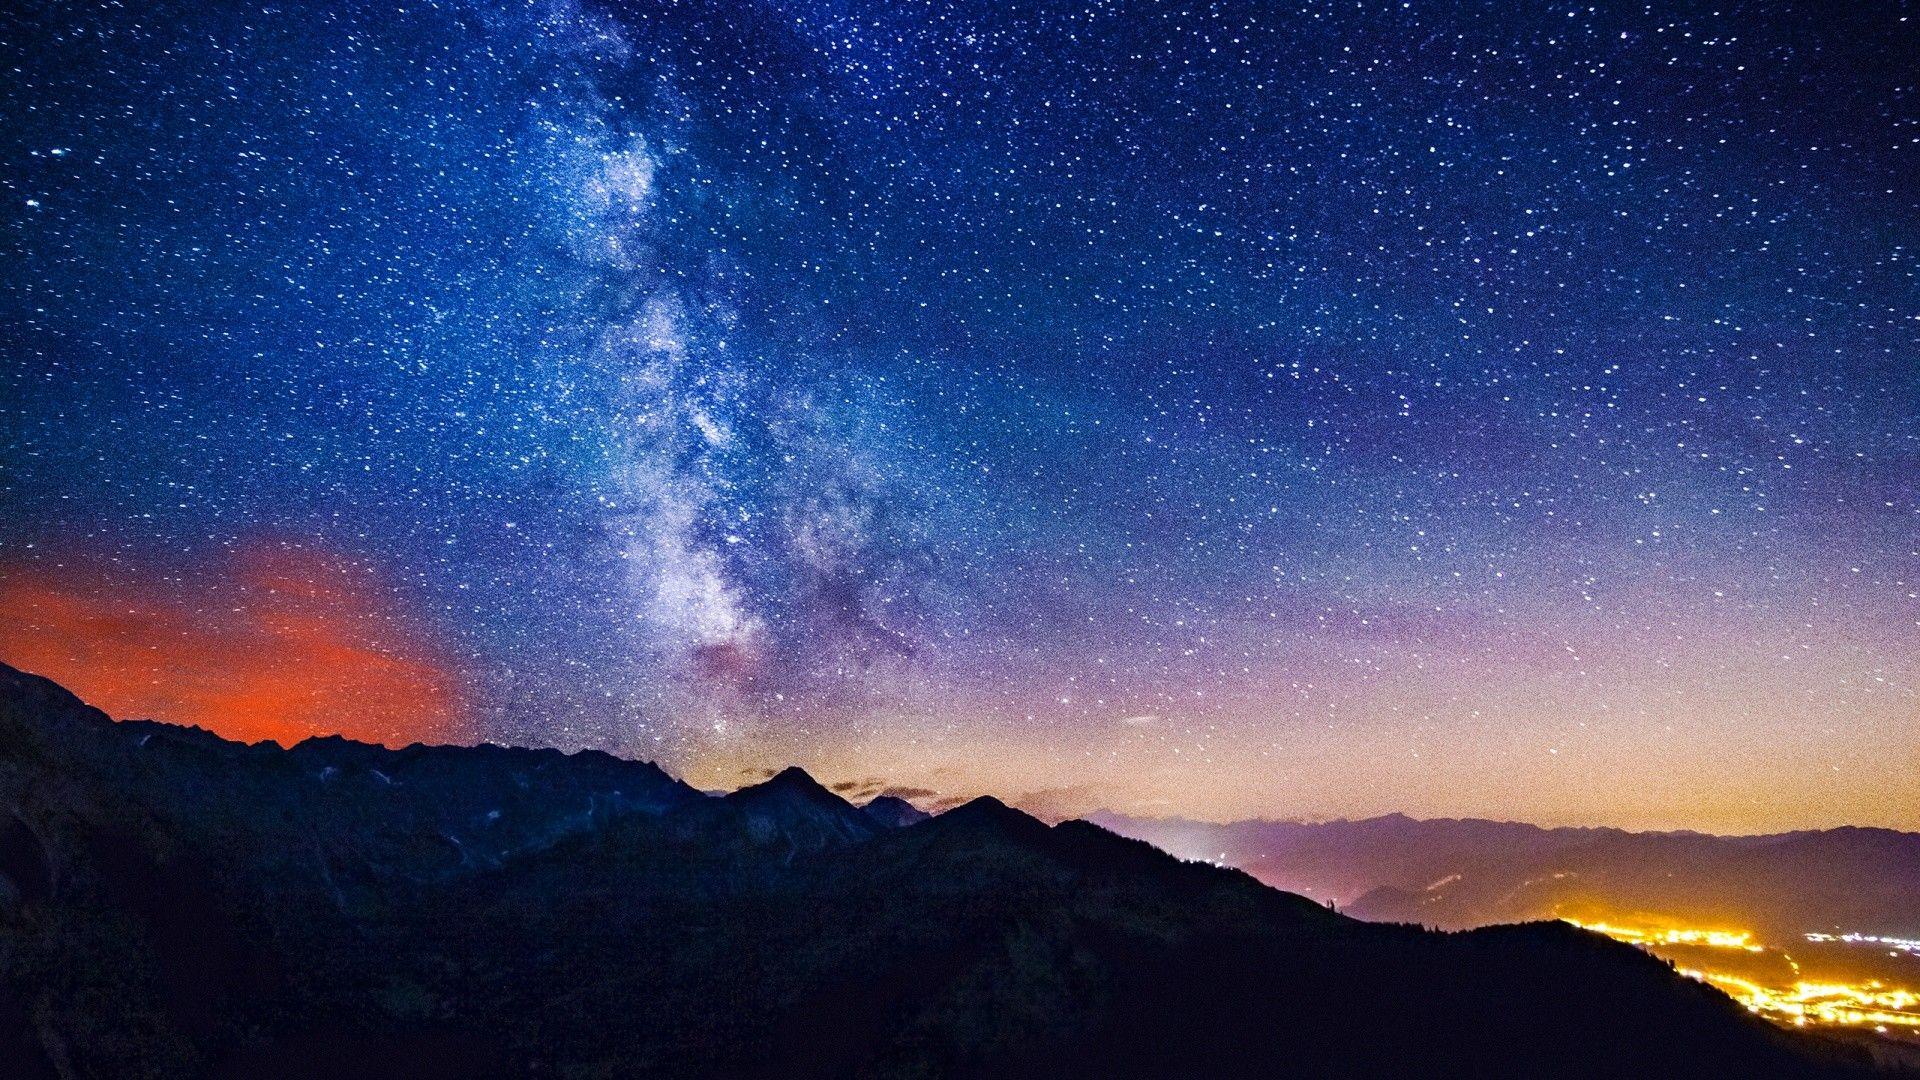 1920x1080 Milky Way Wallpaper Hd 28616 Night Sky Wallpaper Stars Wallpapers Milky Way Wallpaper